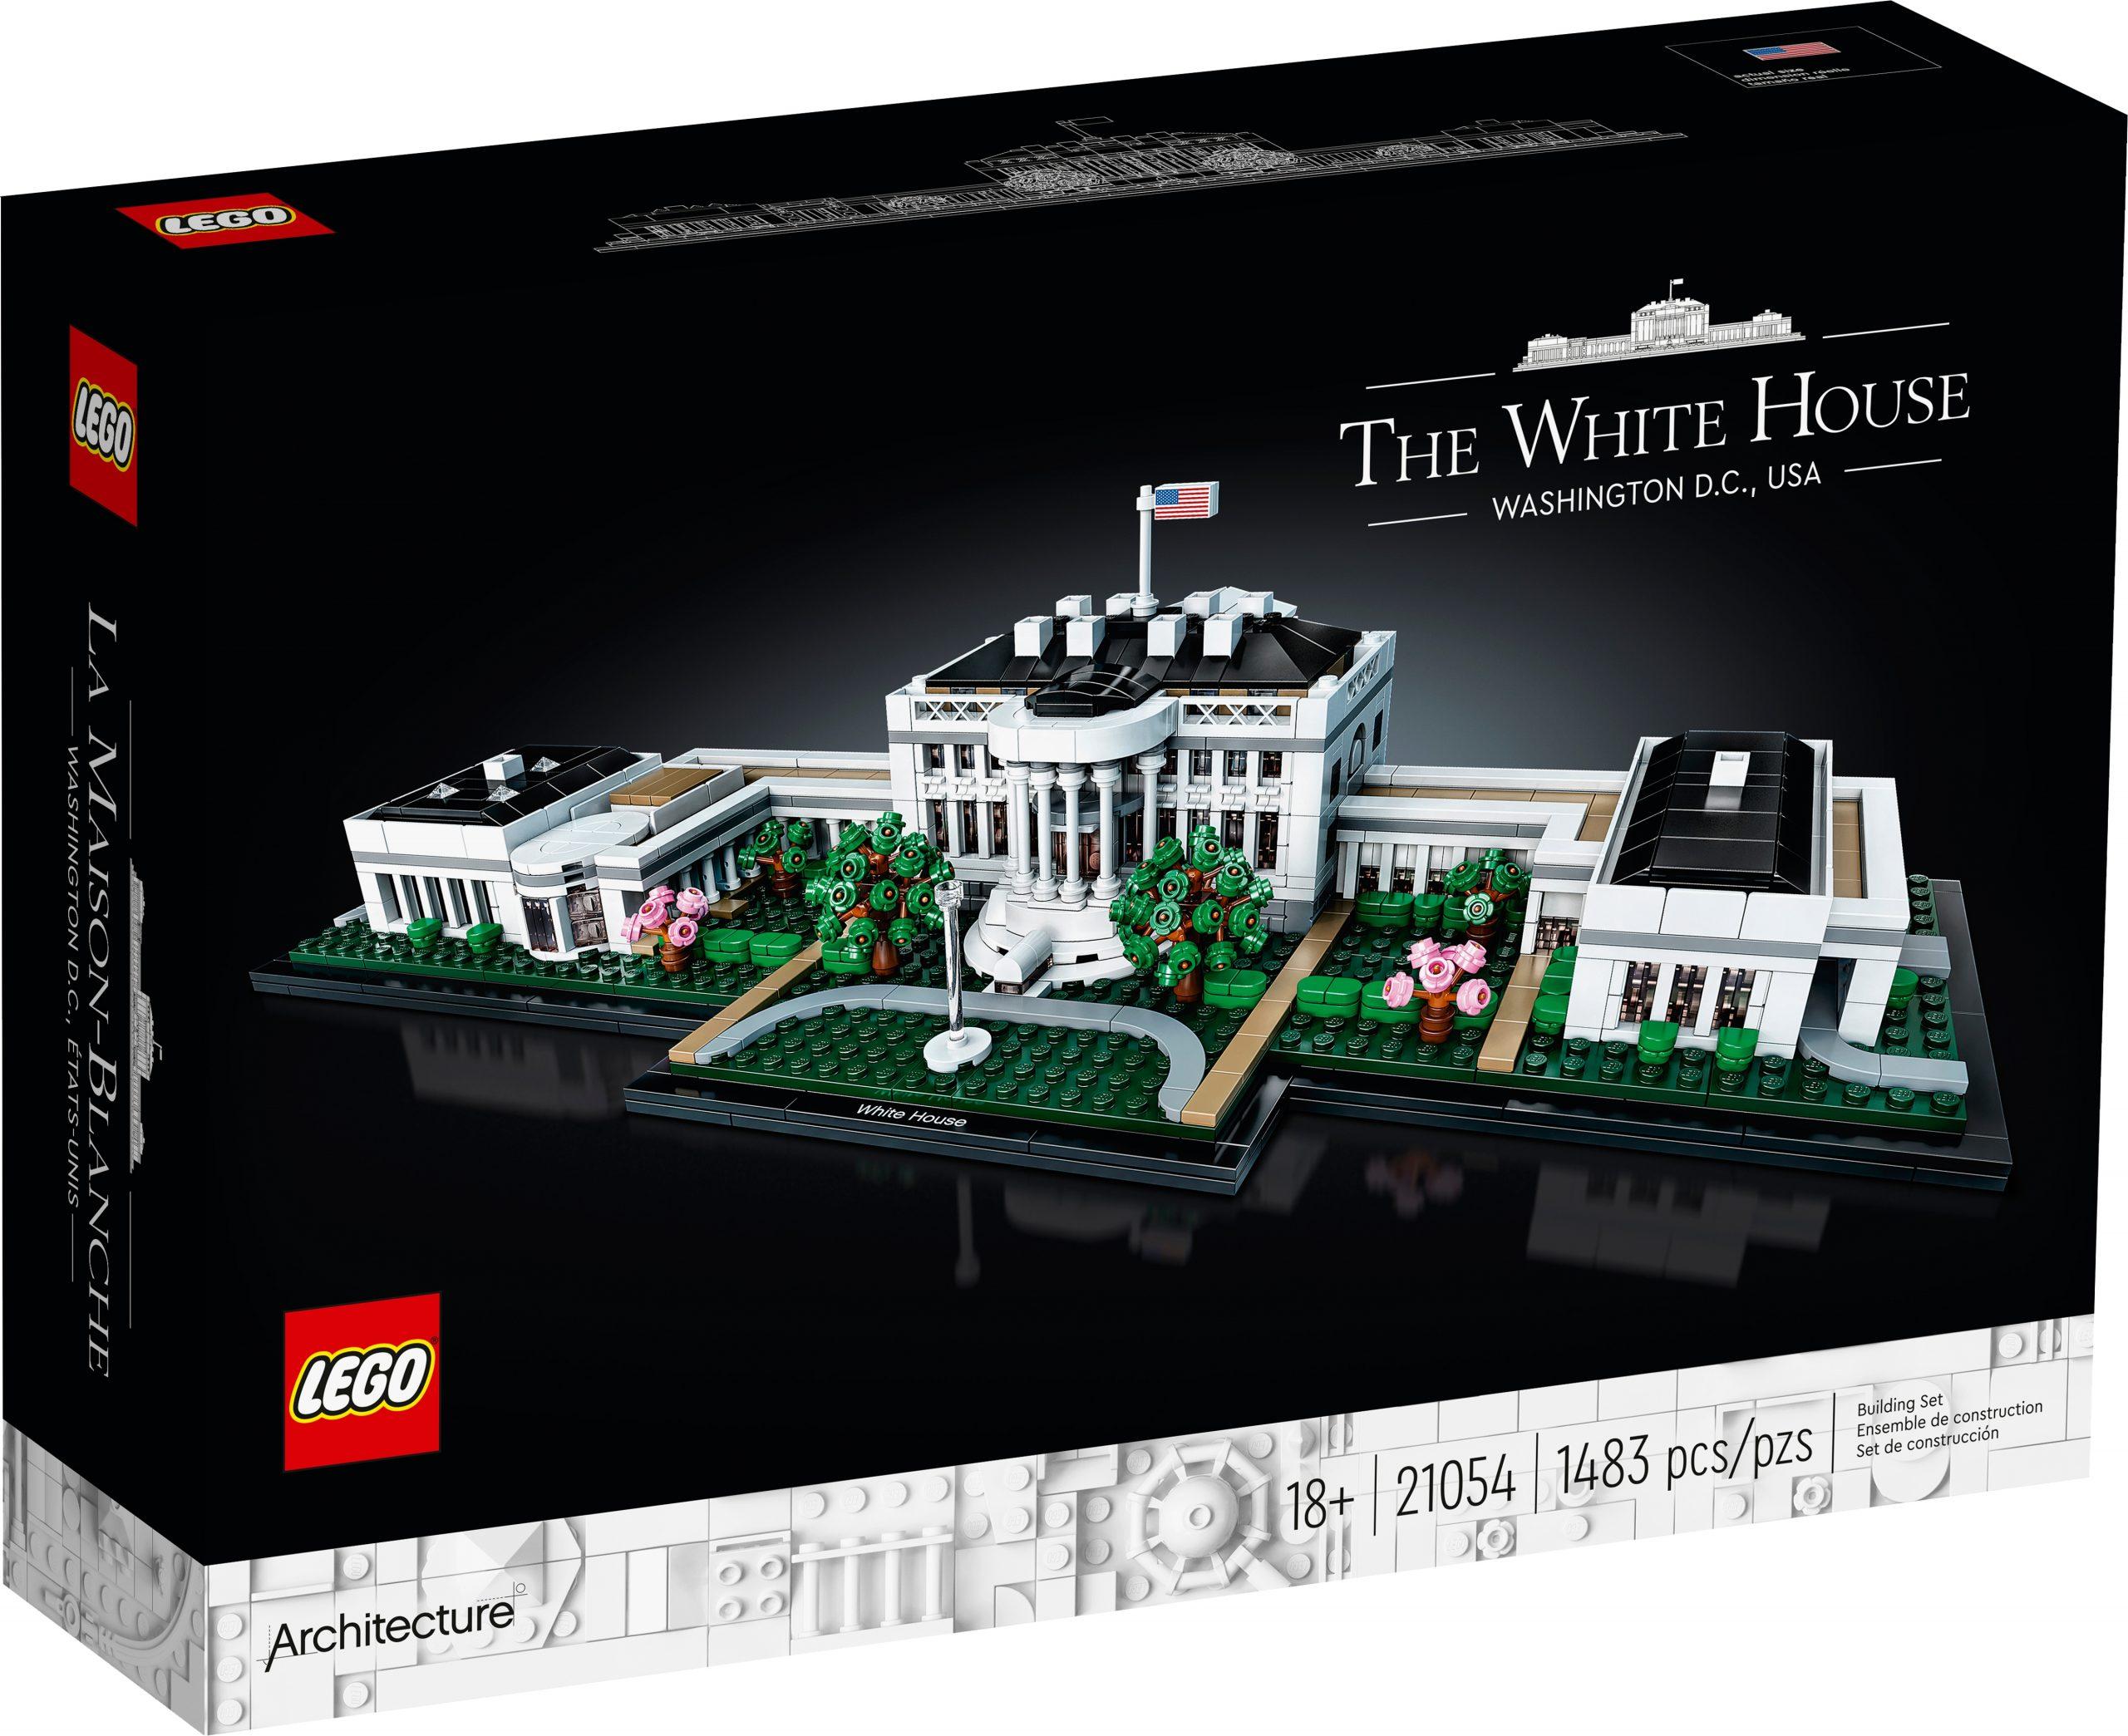 lego 21054 la maison blanche scaled